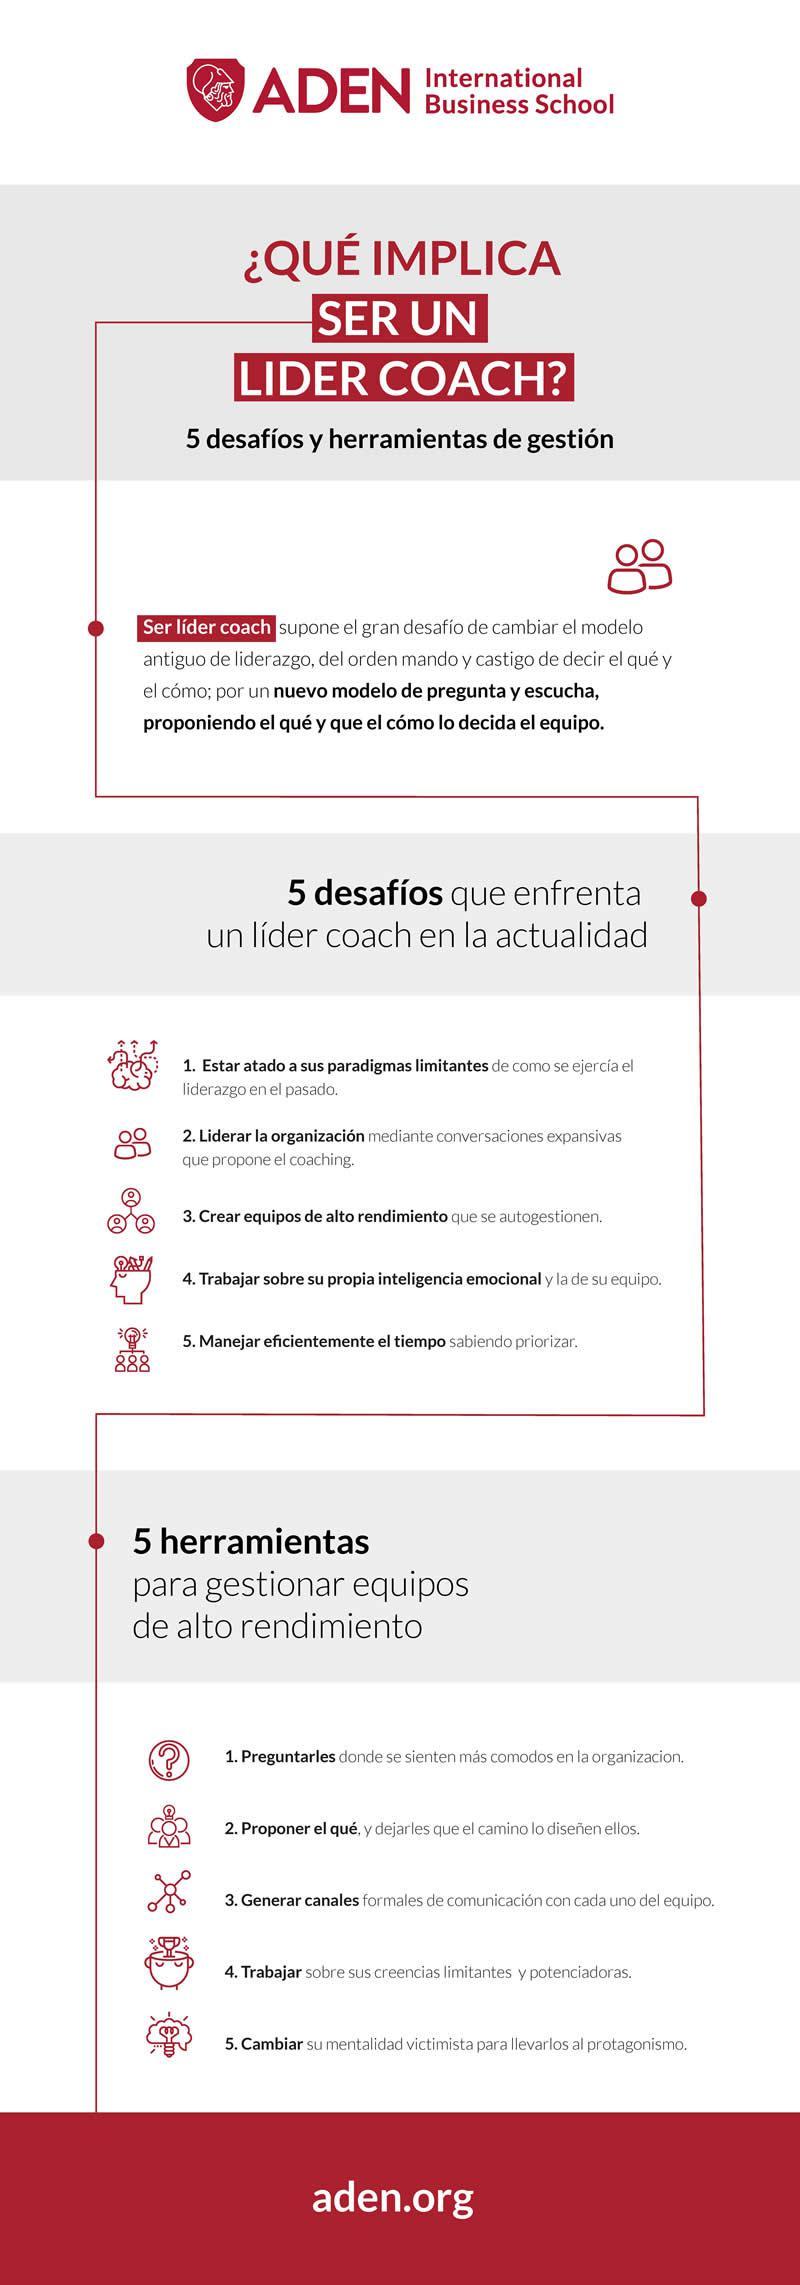 Qué implica ser un Líder Coach #infografia #infographic #leadership